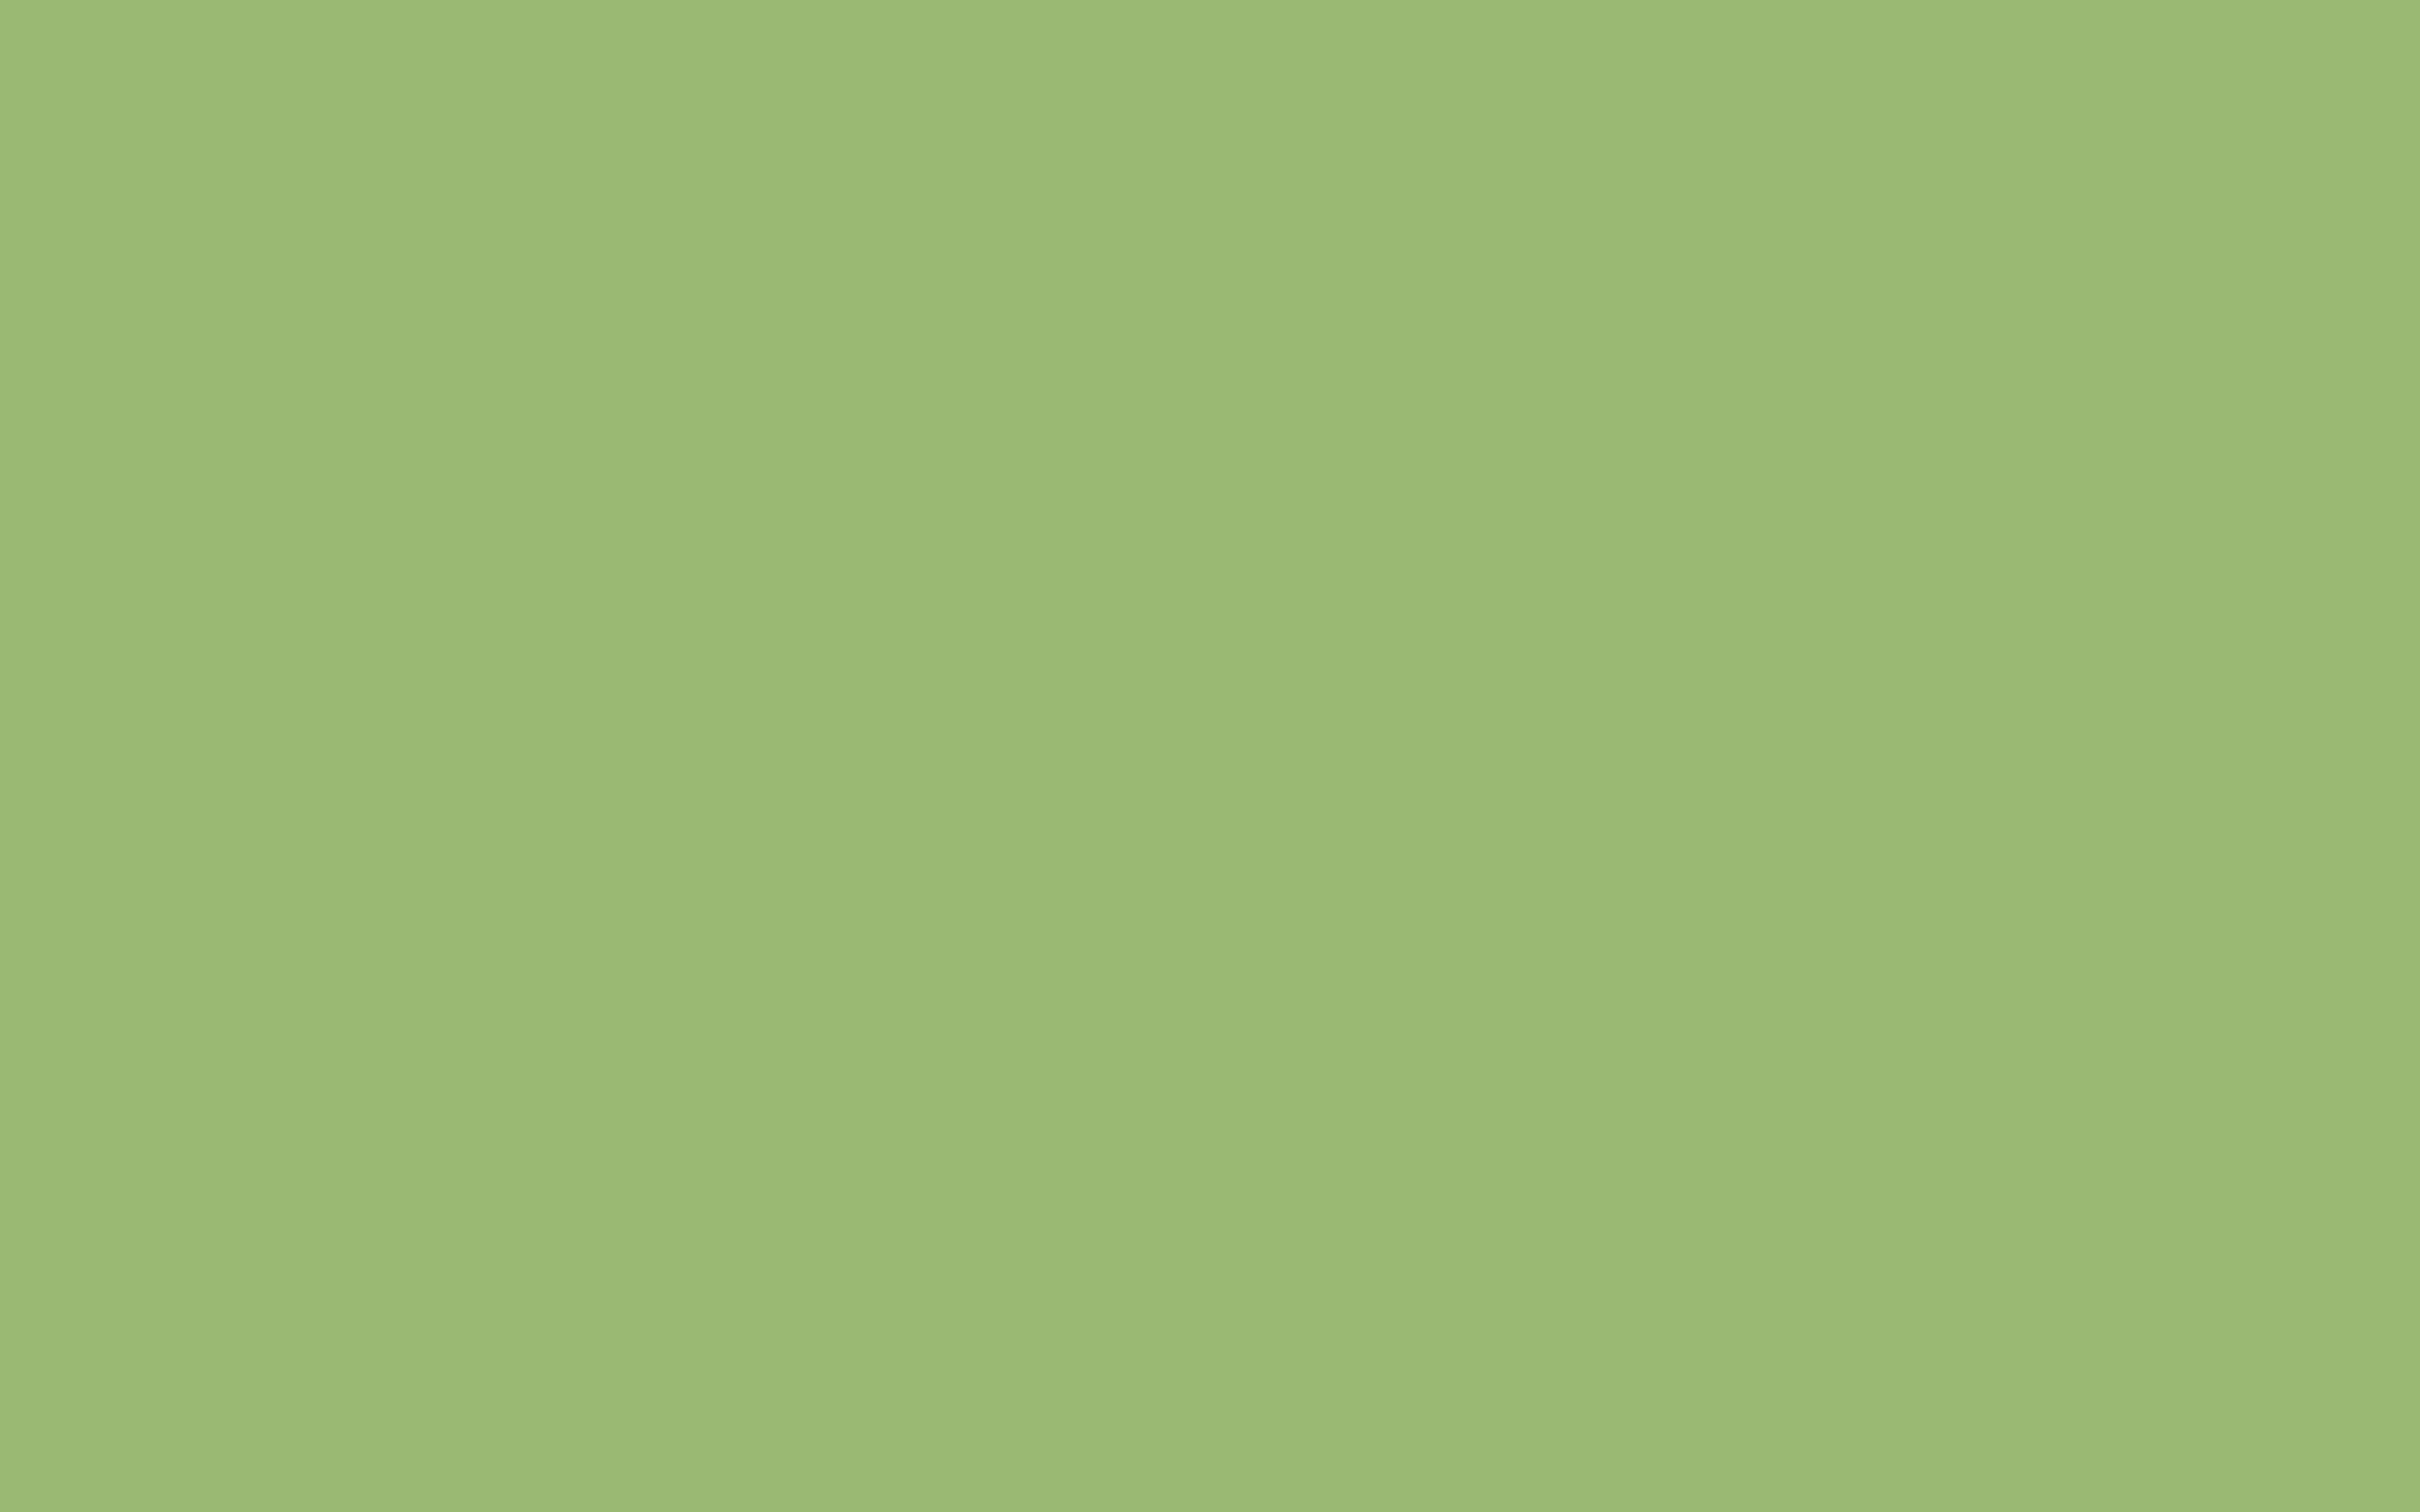 2560x1600 Olivine Solid Color Background